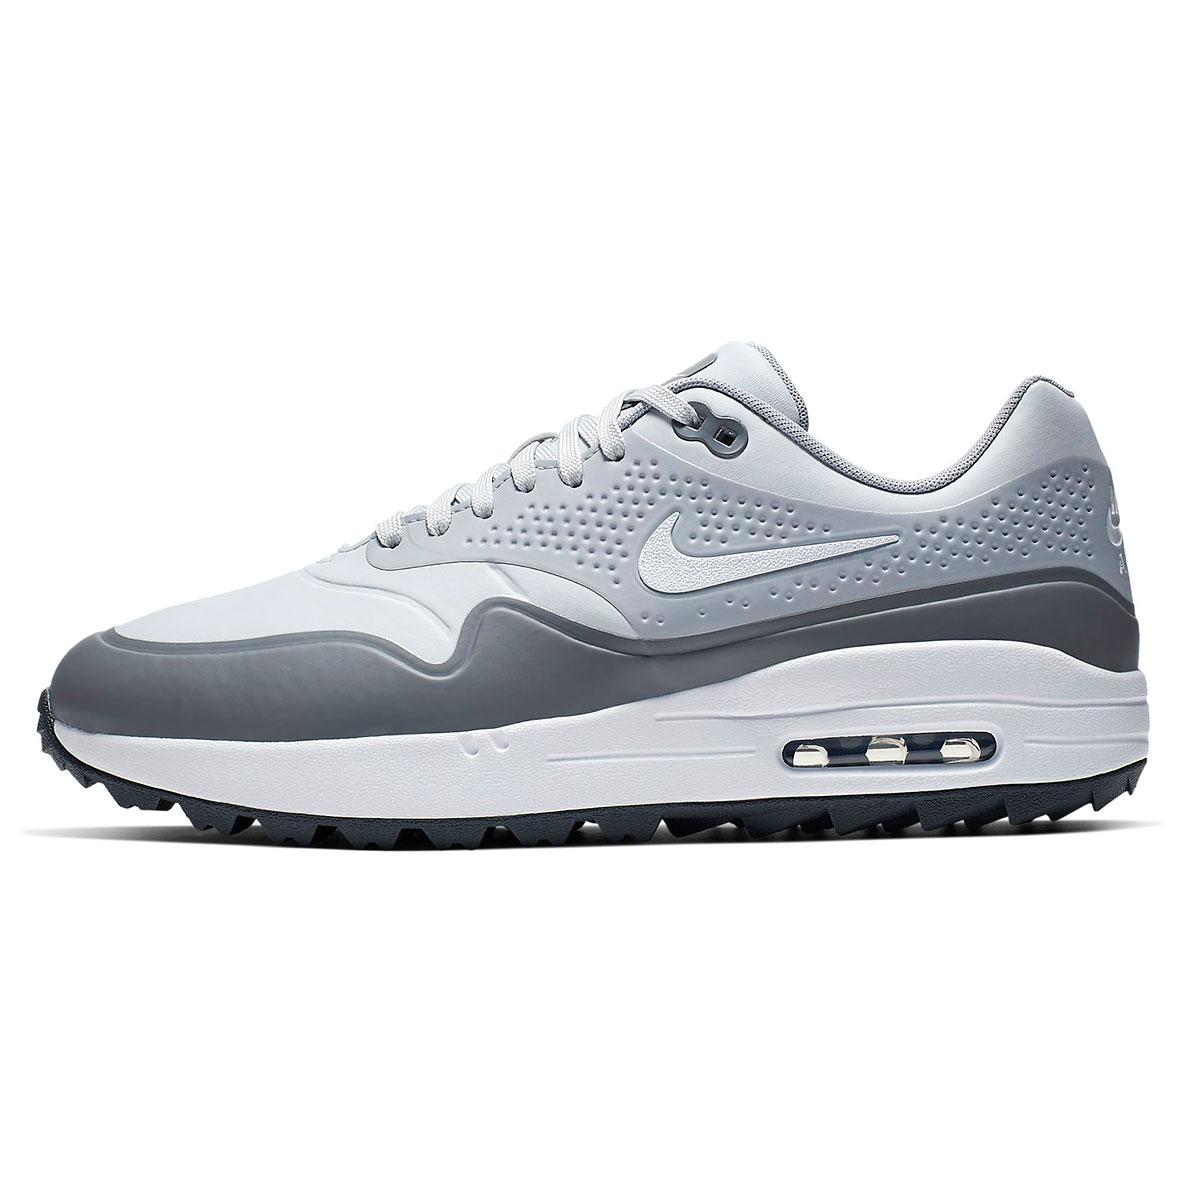 nike air max 1g golf shoes grey Off 79%